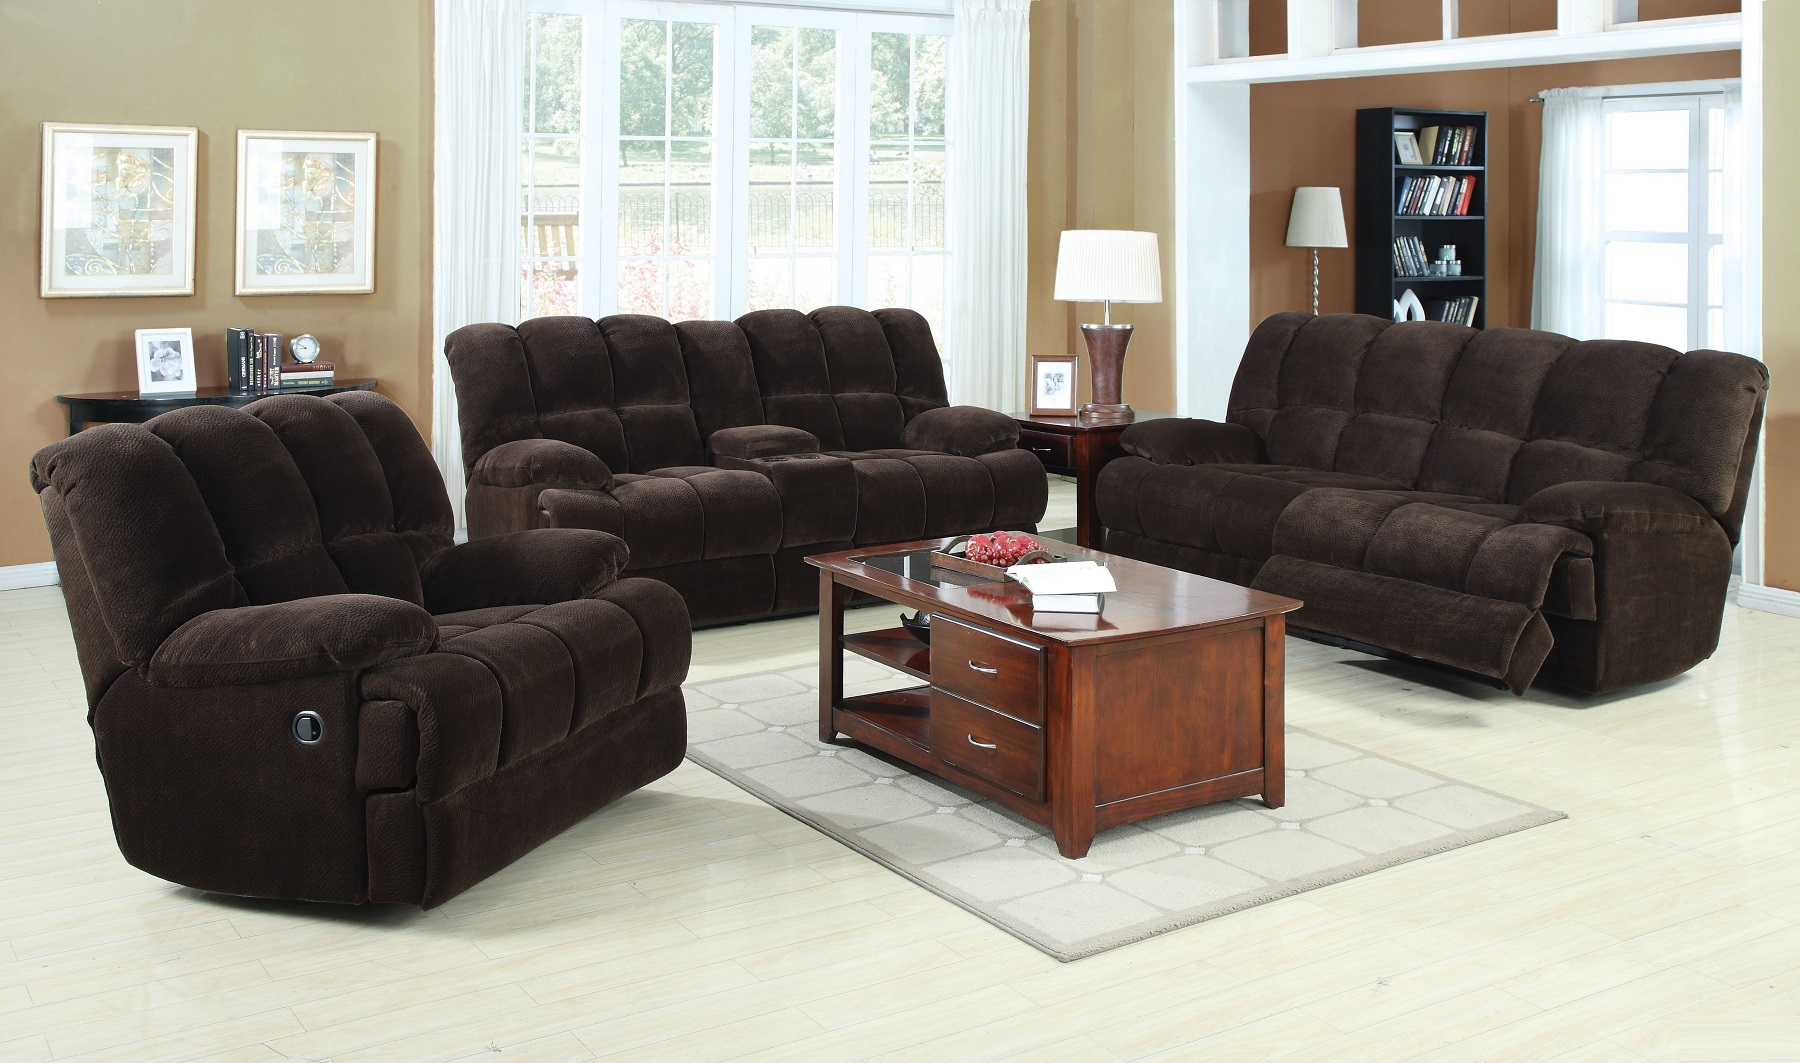 Oversized Reclining Sofa